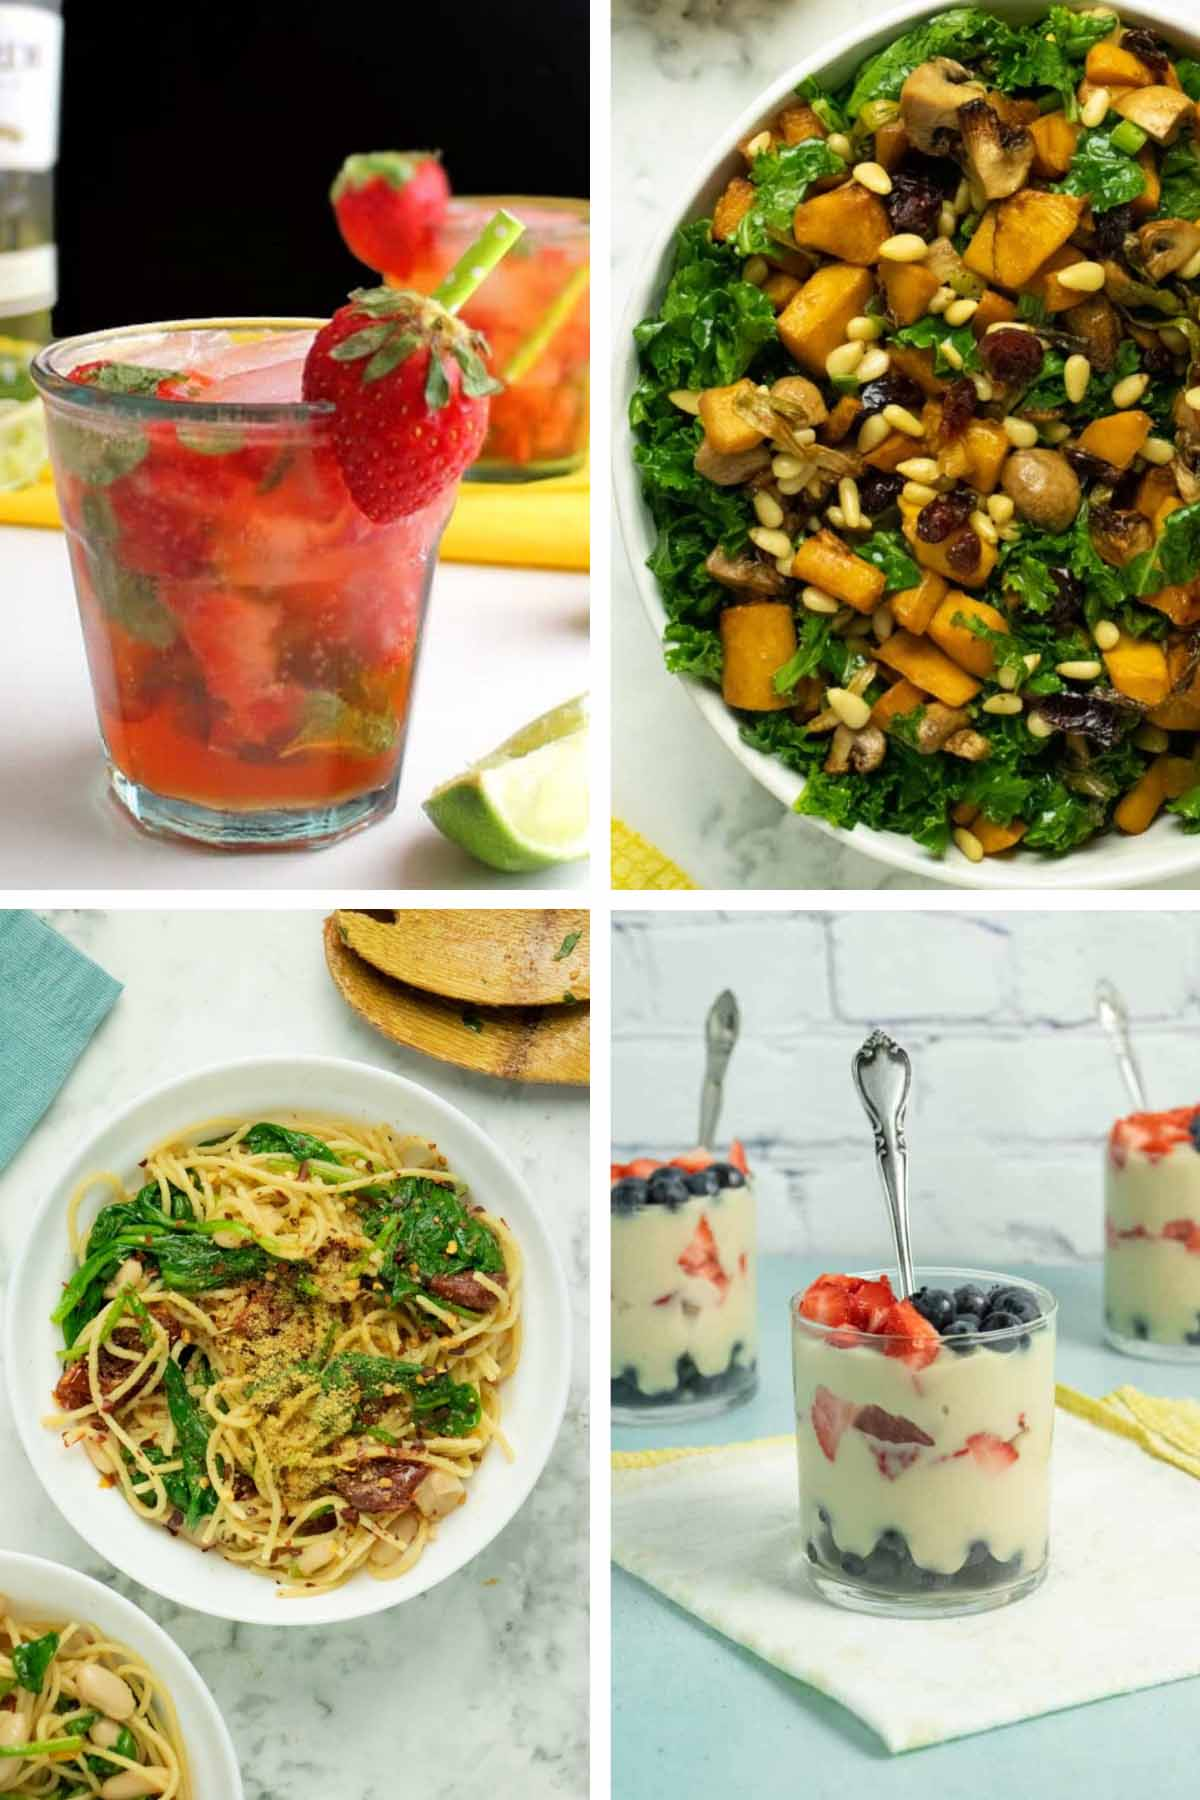 image collage of a 4-course vegan Valentine's Day menu: cocktail, salad, pasta, dessert